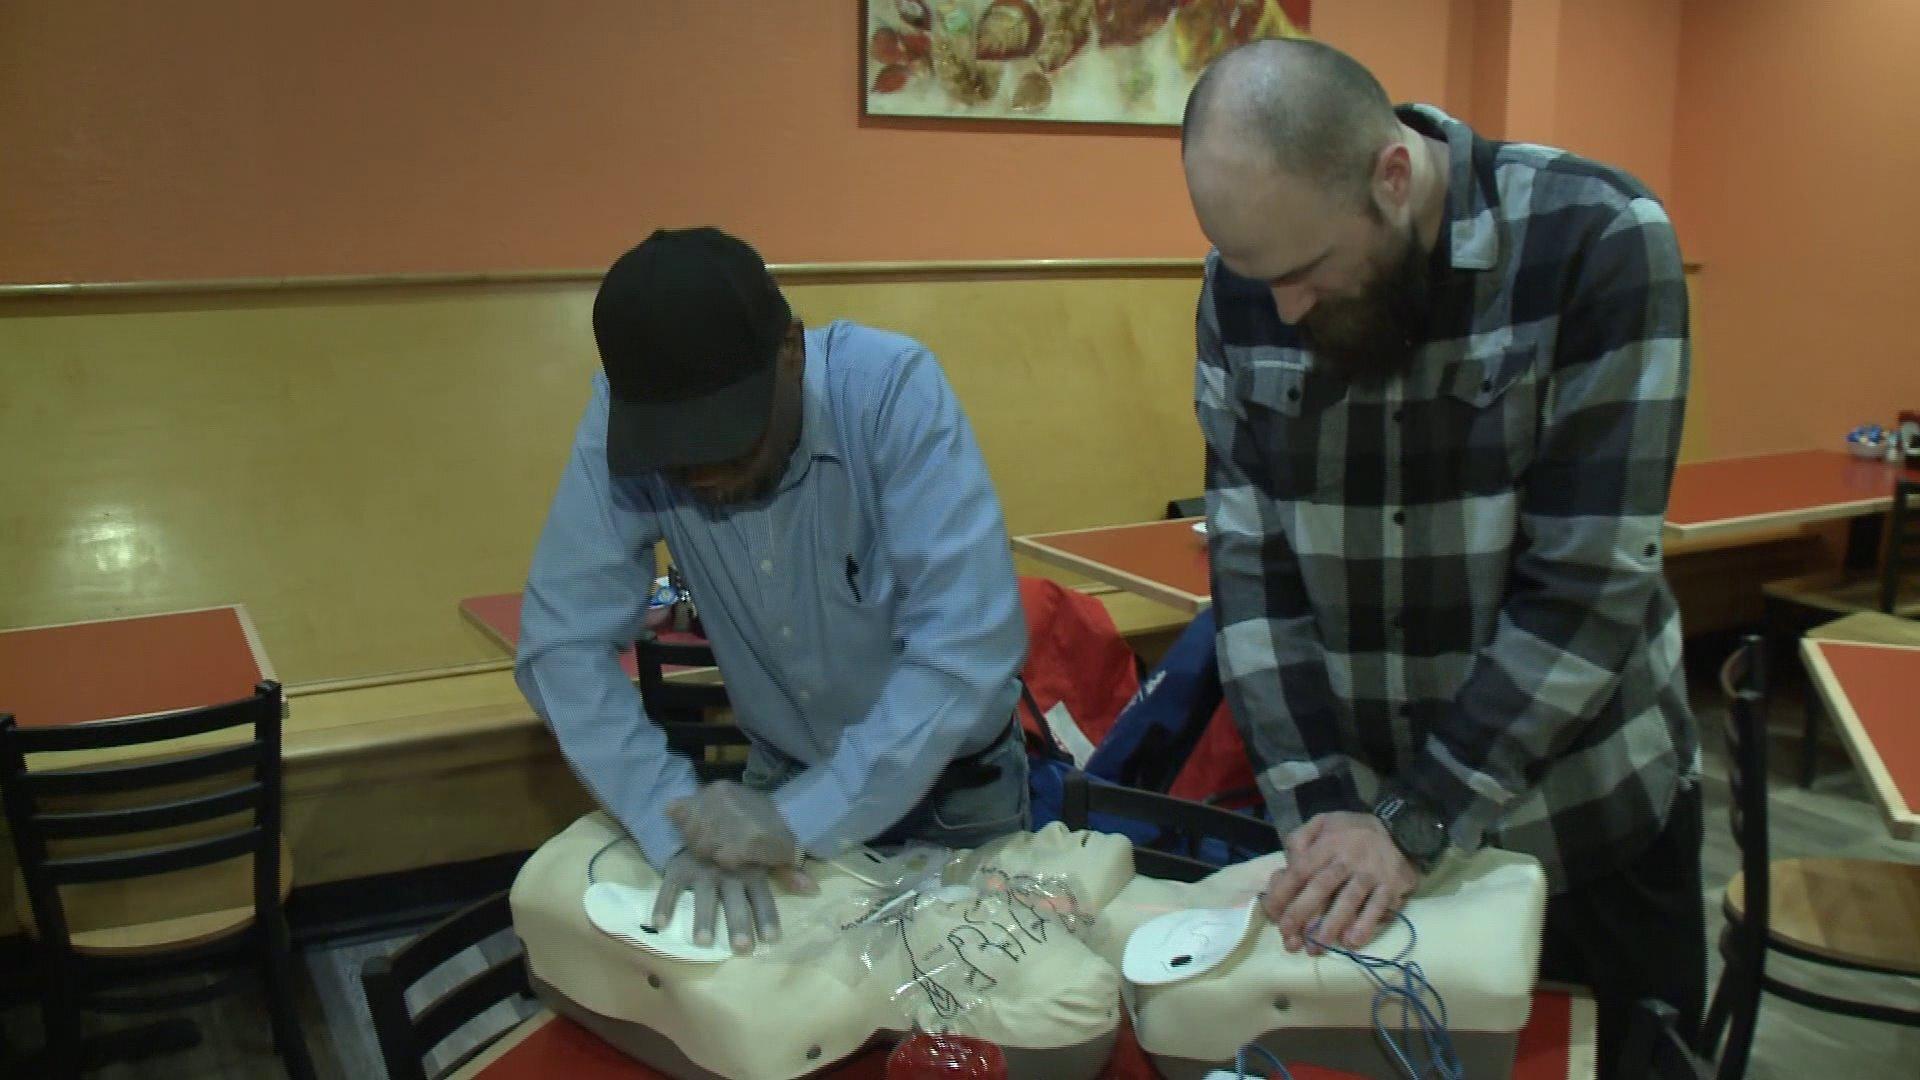 Photos: Training to save lives: Chesapeake restaurant employees take action after child's chokingincident